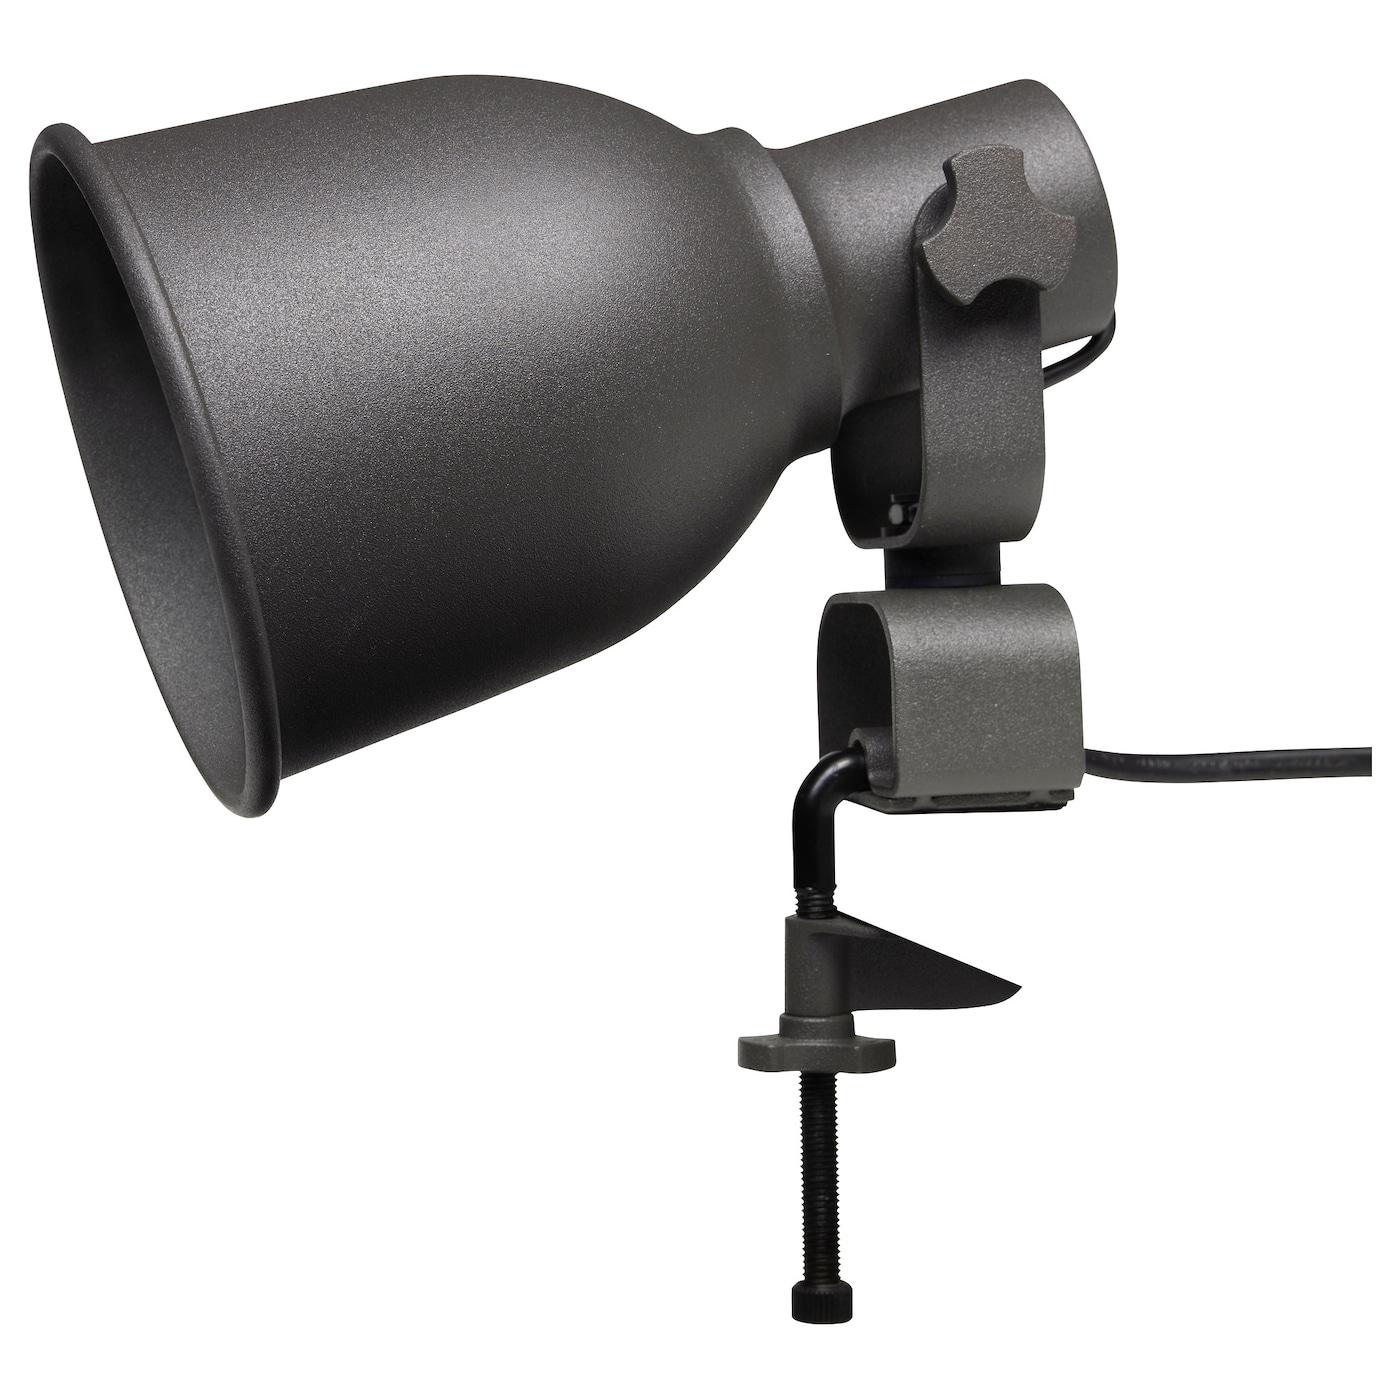 slaapkamer verlichting lampen ikea. Black Bedroom Furniture Sets. Home Design Ideas